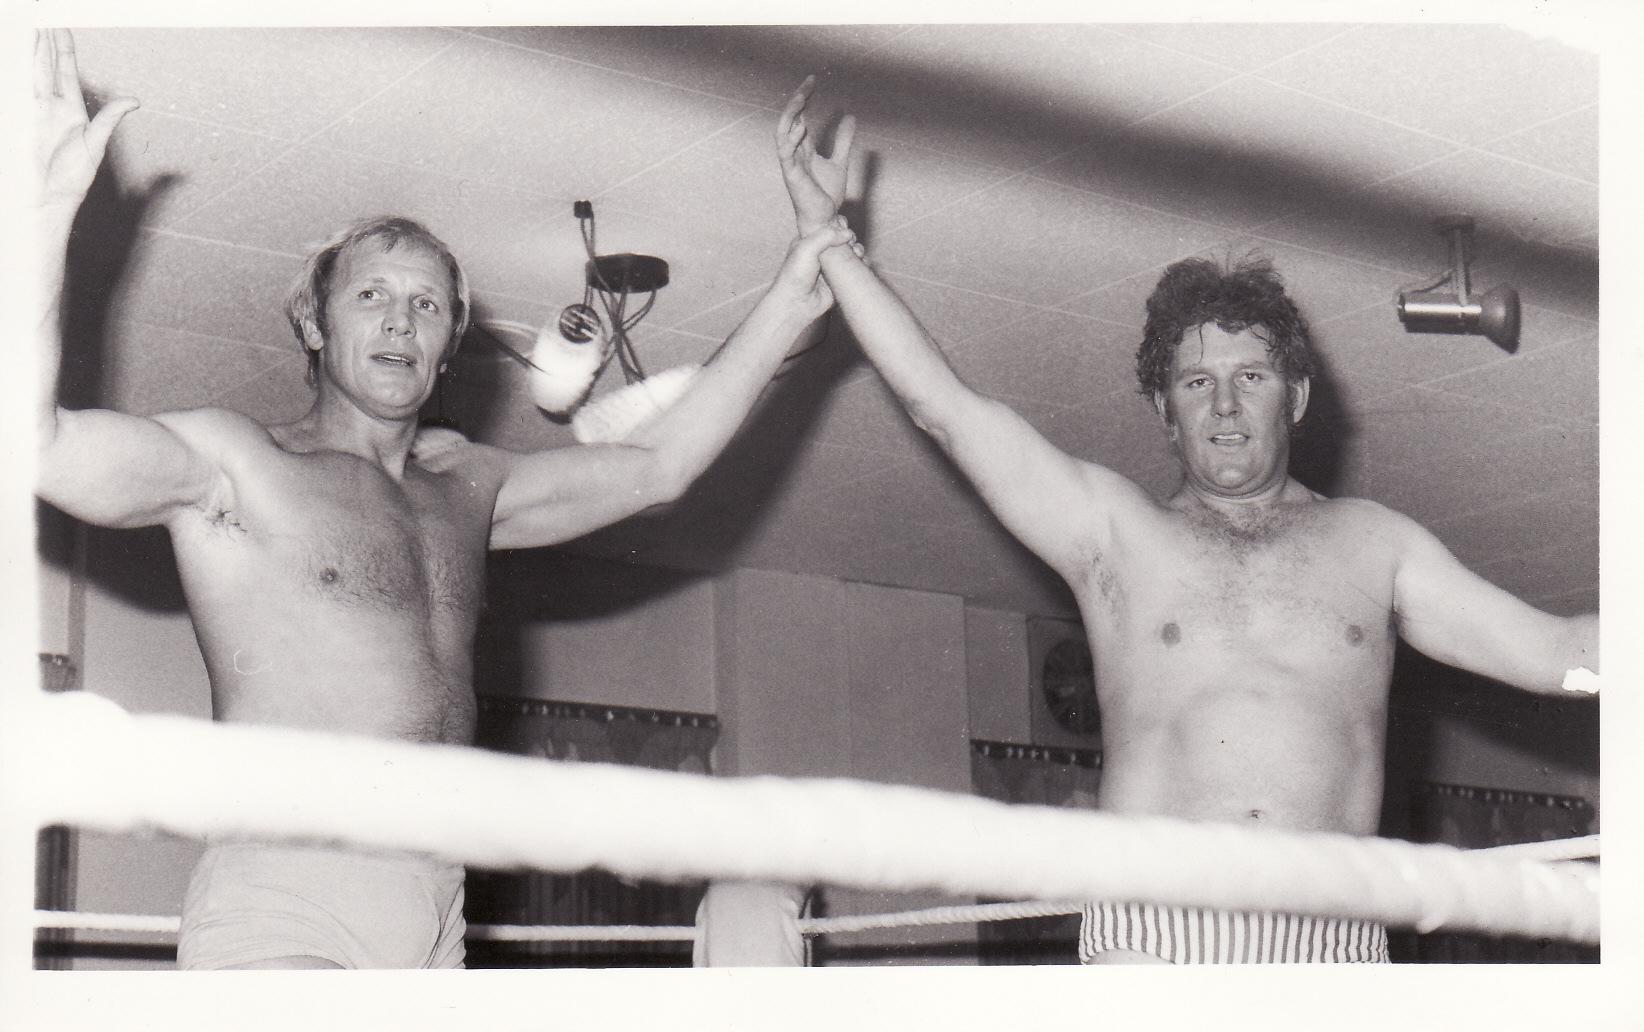 Steve Veidor and Rik Sands